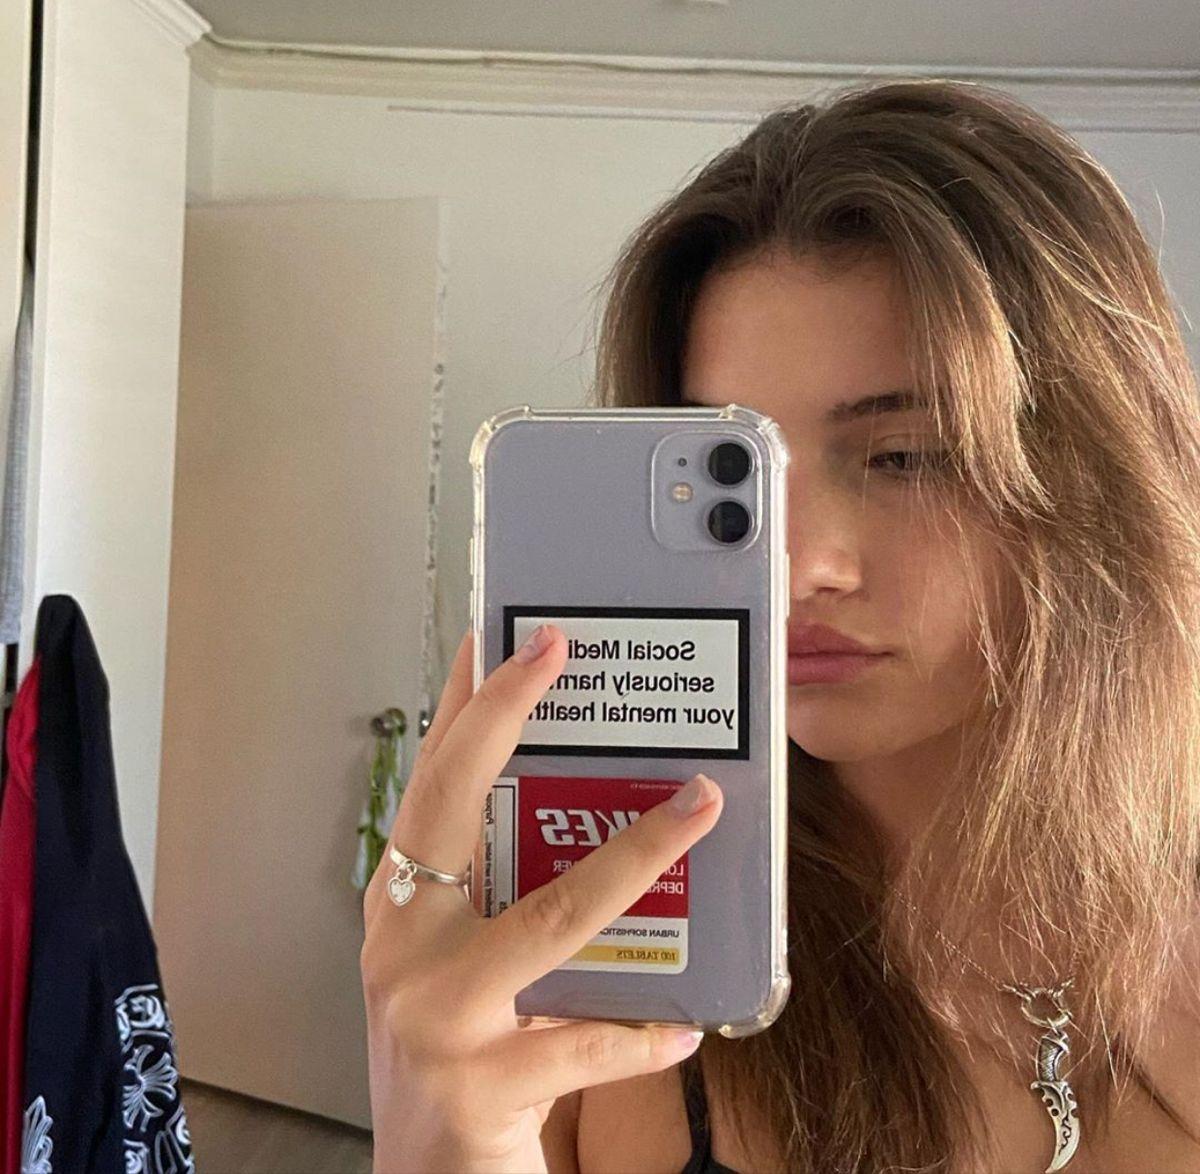 Alexis jayde on instagram raided the camera roll